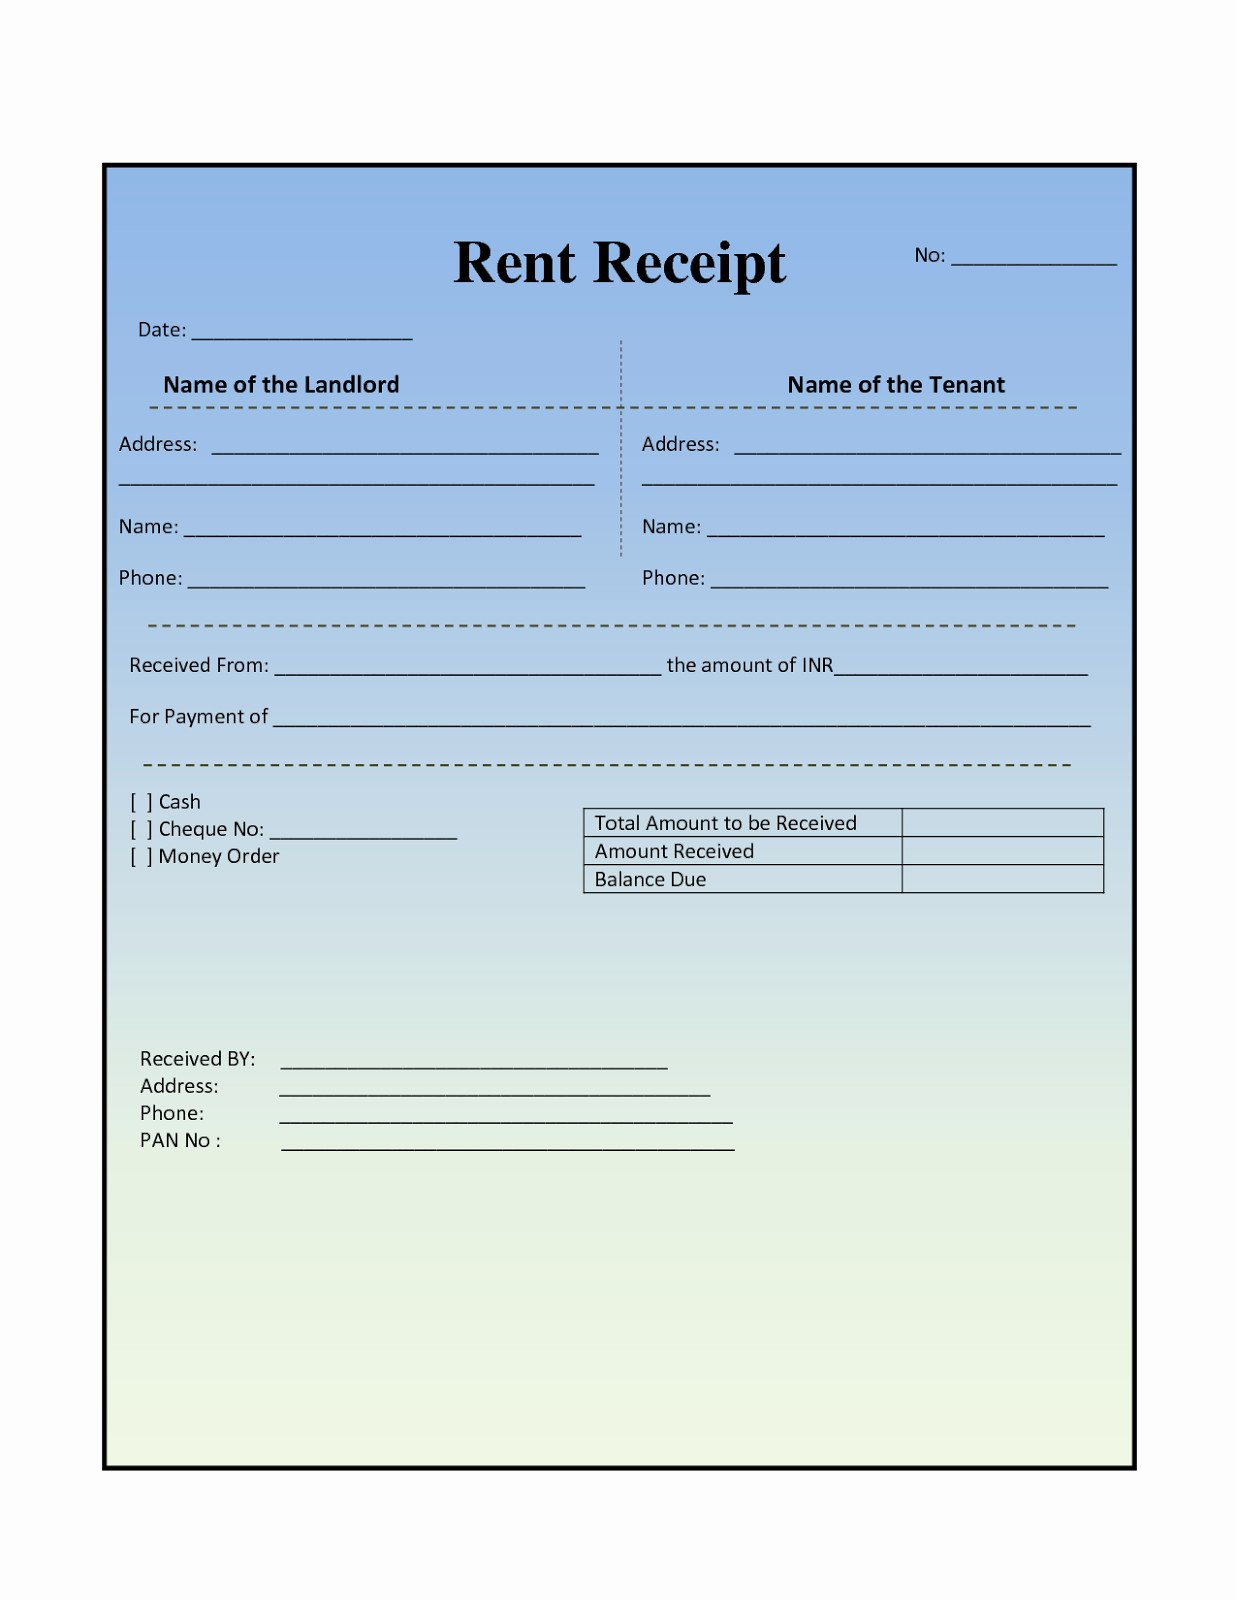 Rental Invoice Template Excel Unique Sample Rent Receipt Template New House Rental Invoice